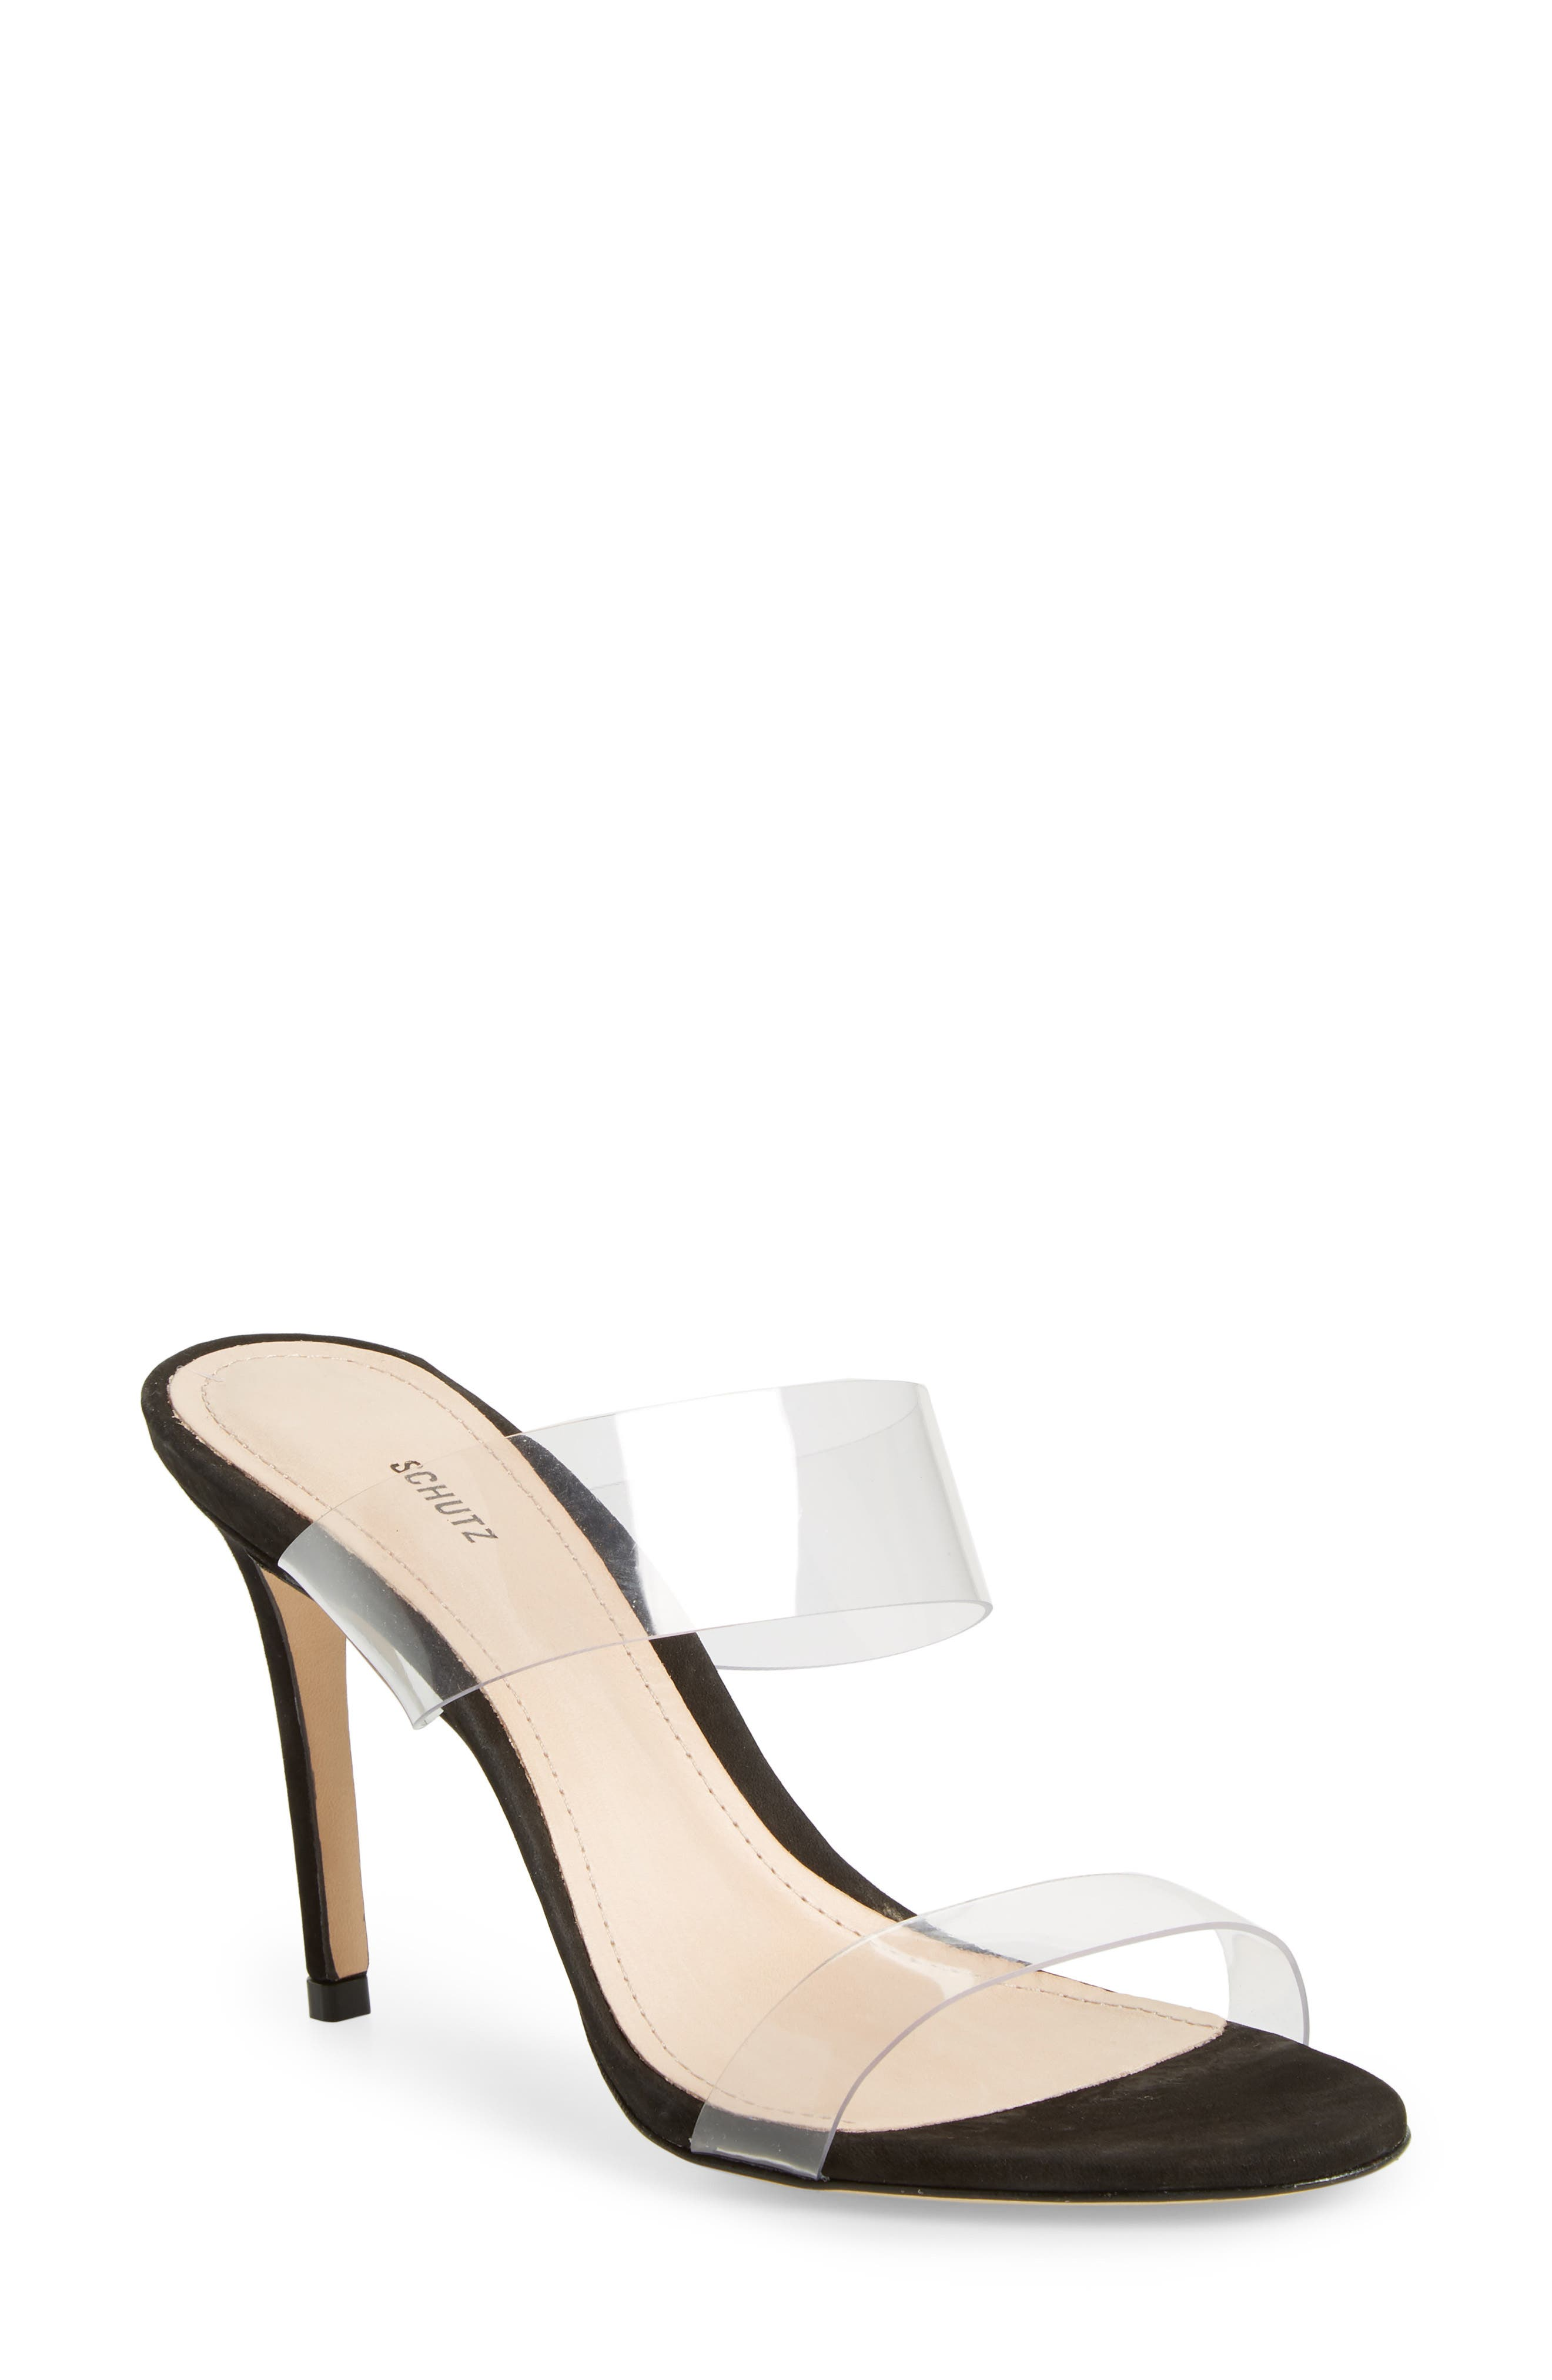 Ariella Sandal,                         Main,                         color, BLACK/TRANSPARENT VINYL FABRIC